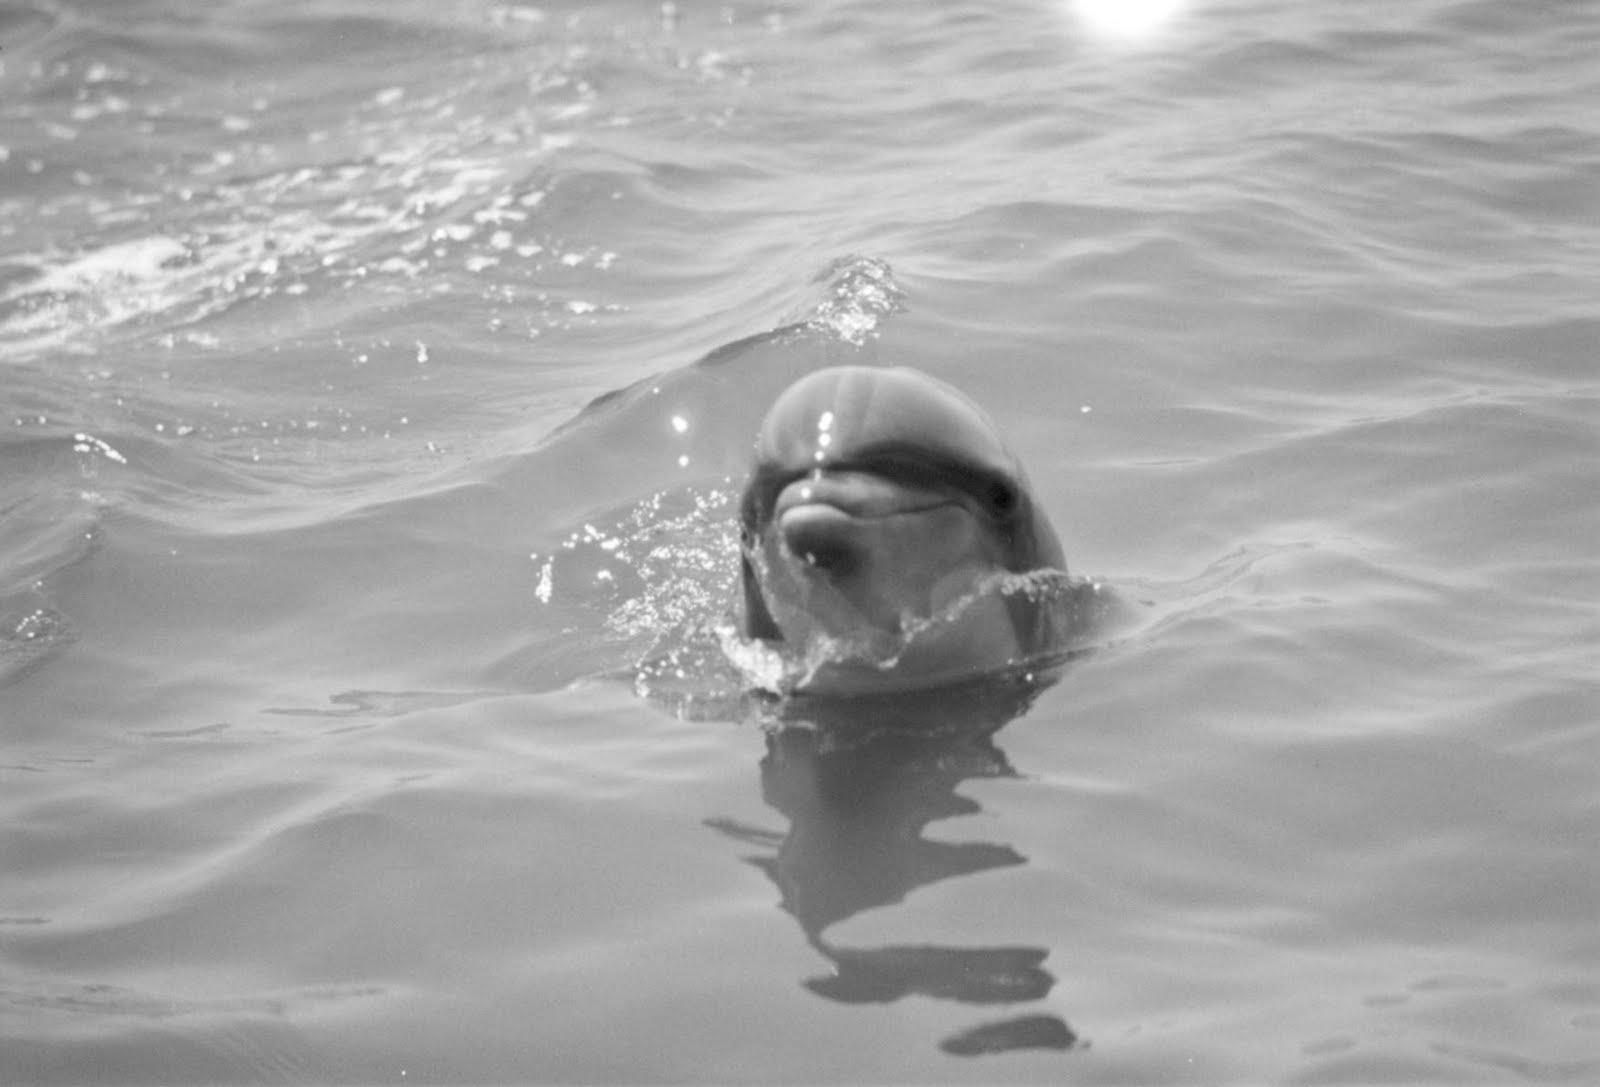 My Beautiful Picutre Album: Dolphins' Cute Faces